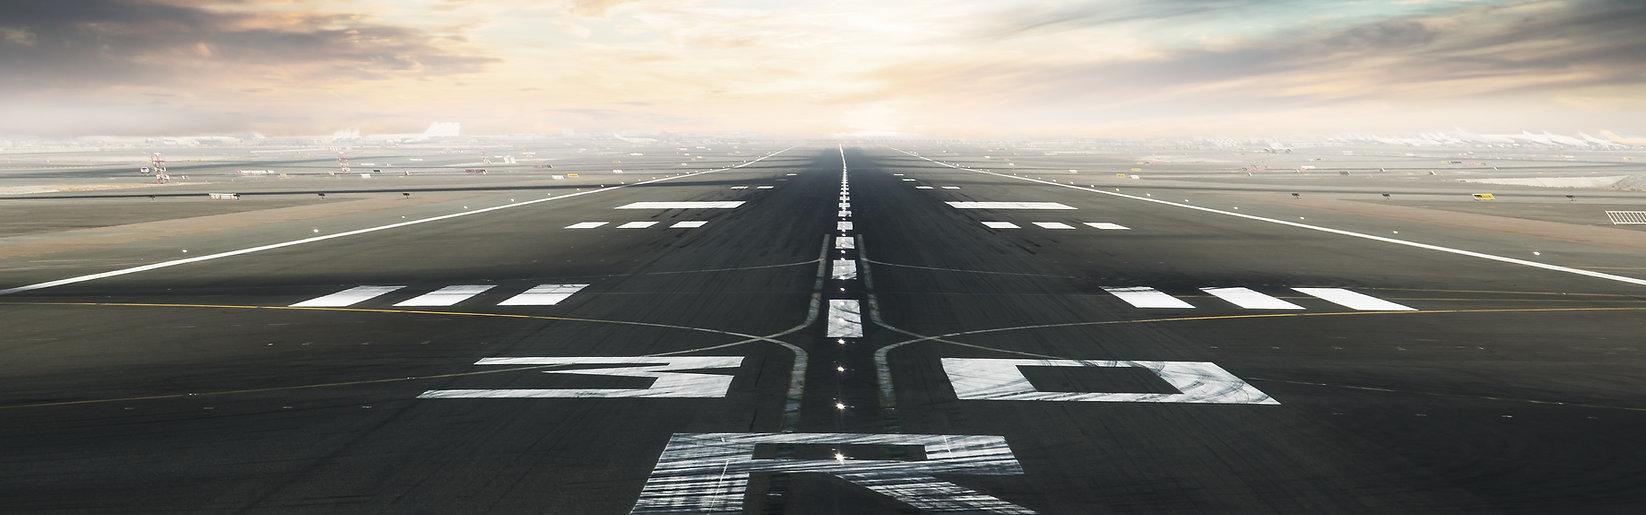 Empty asphalt airport runway with dramat